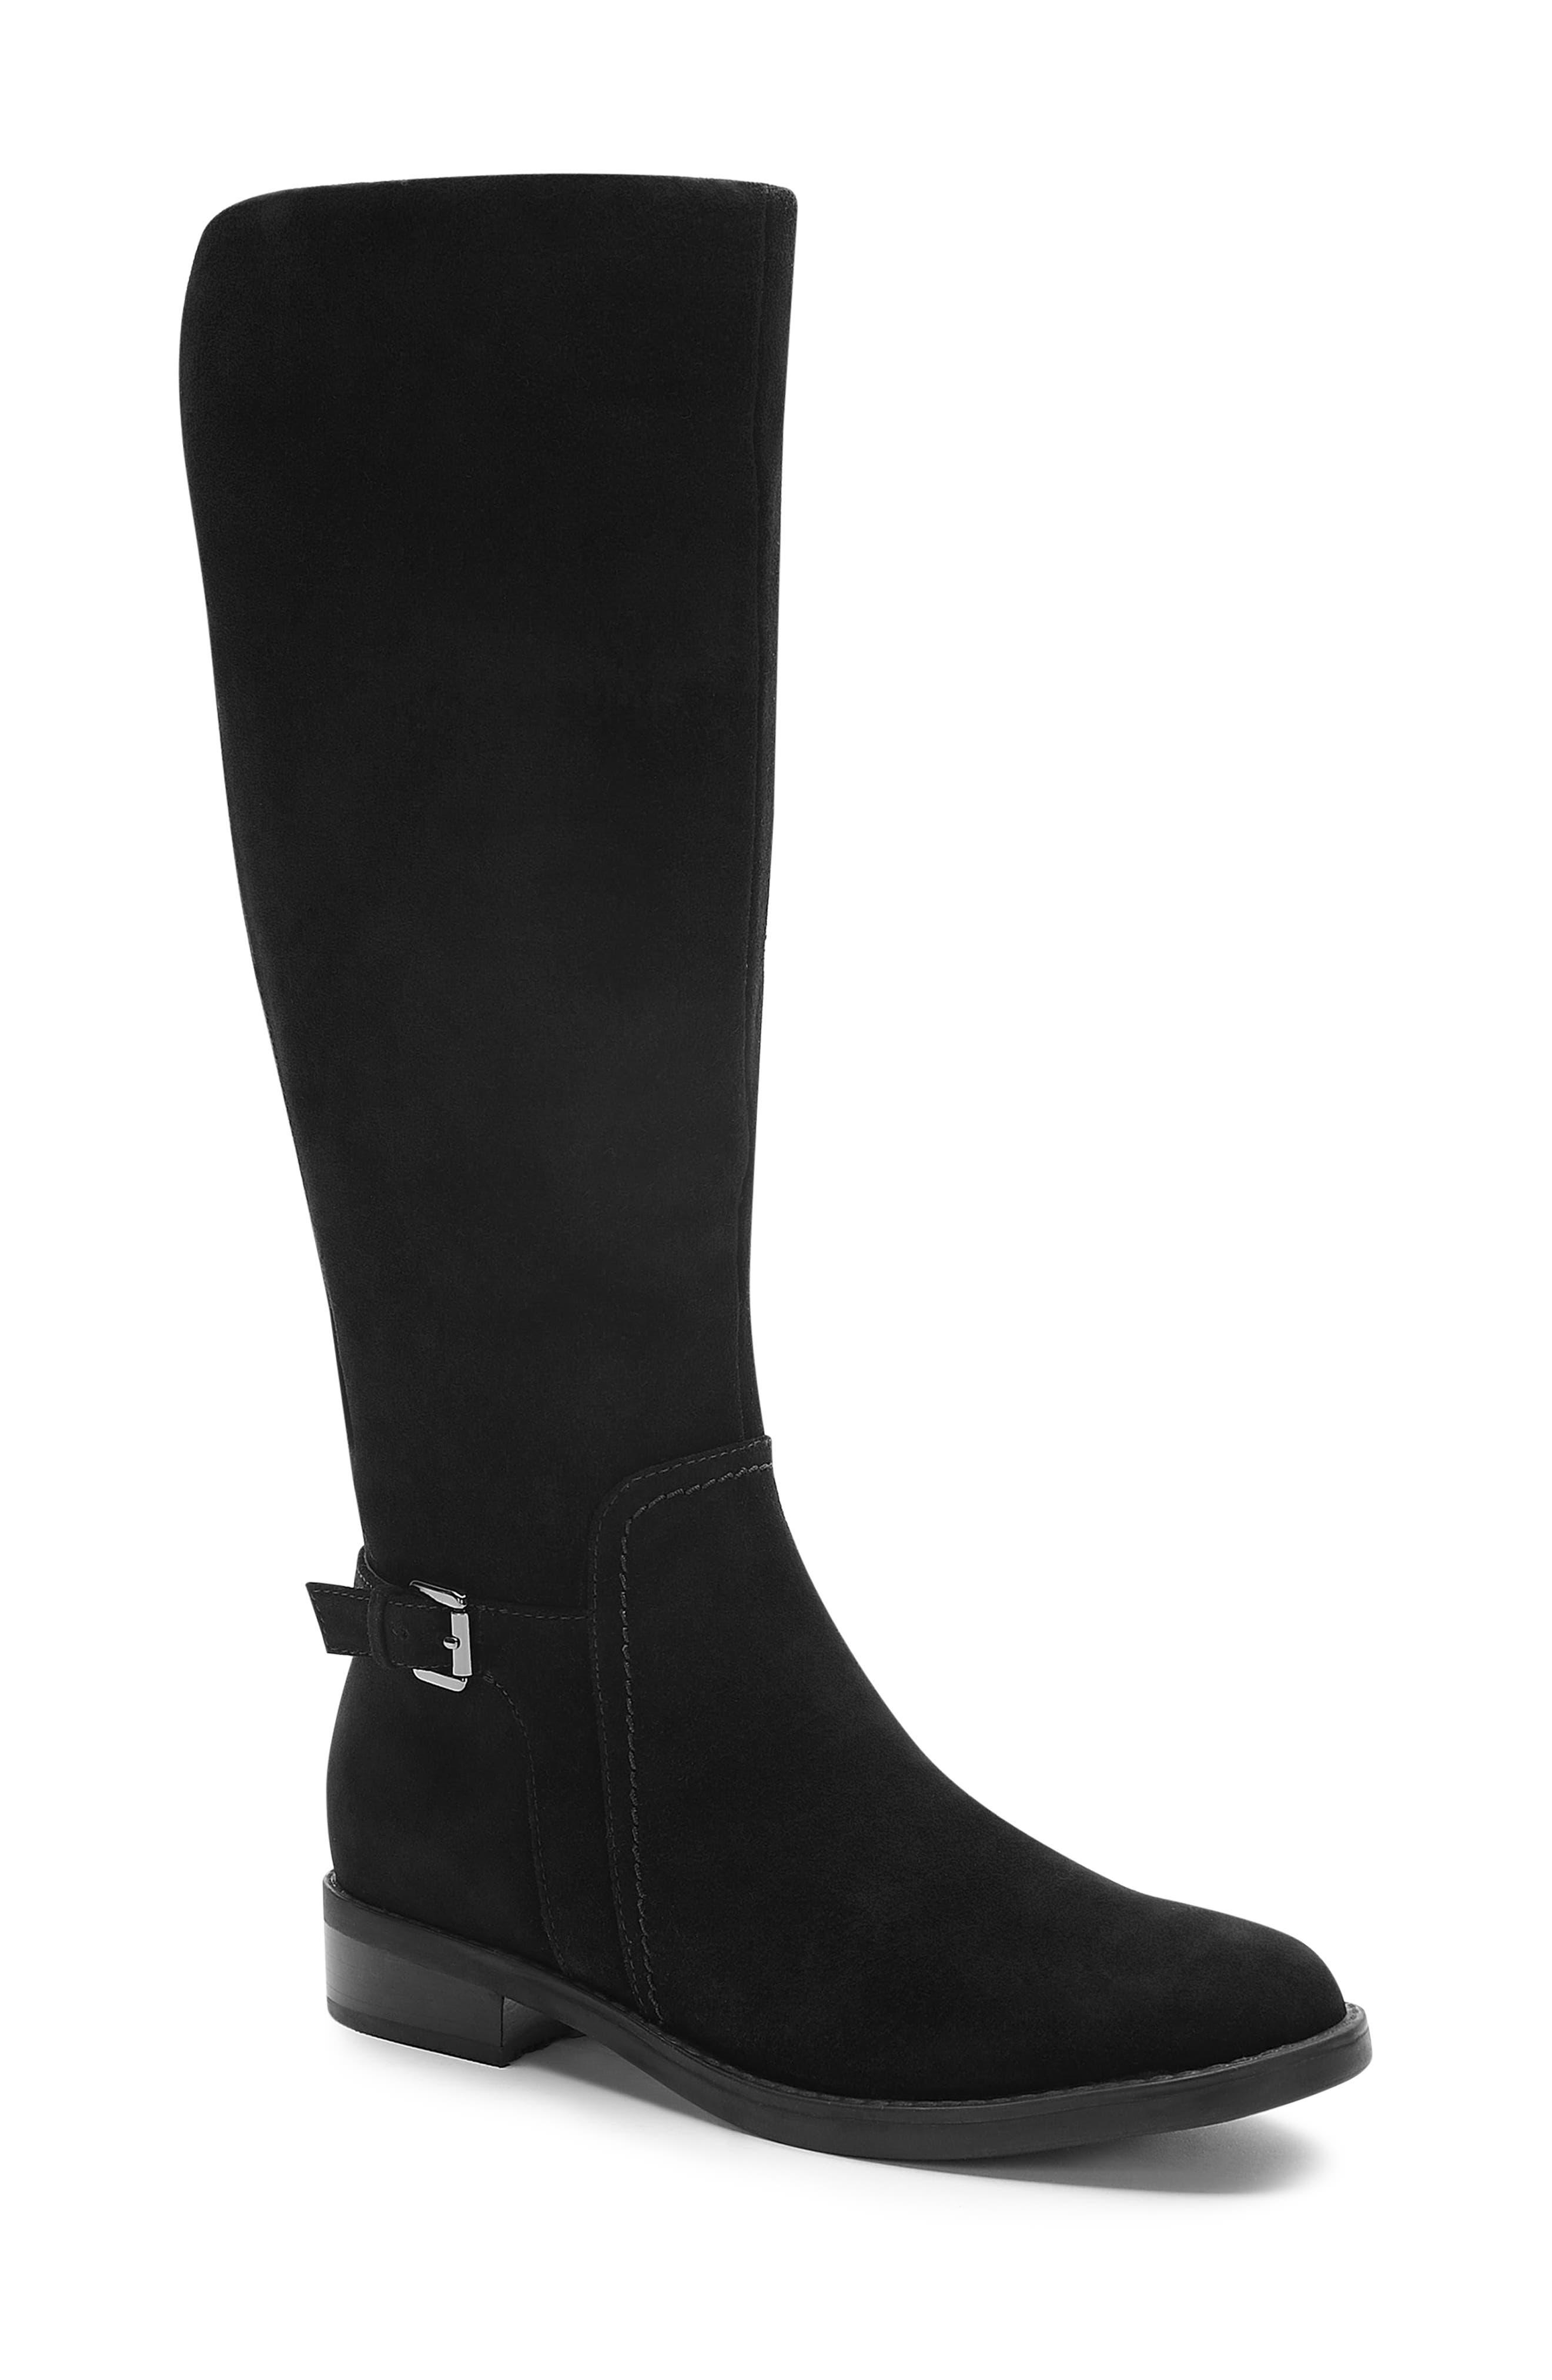 Blondo Evie Riding Waterproof Boot W - Black